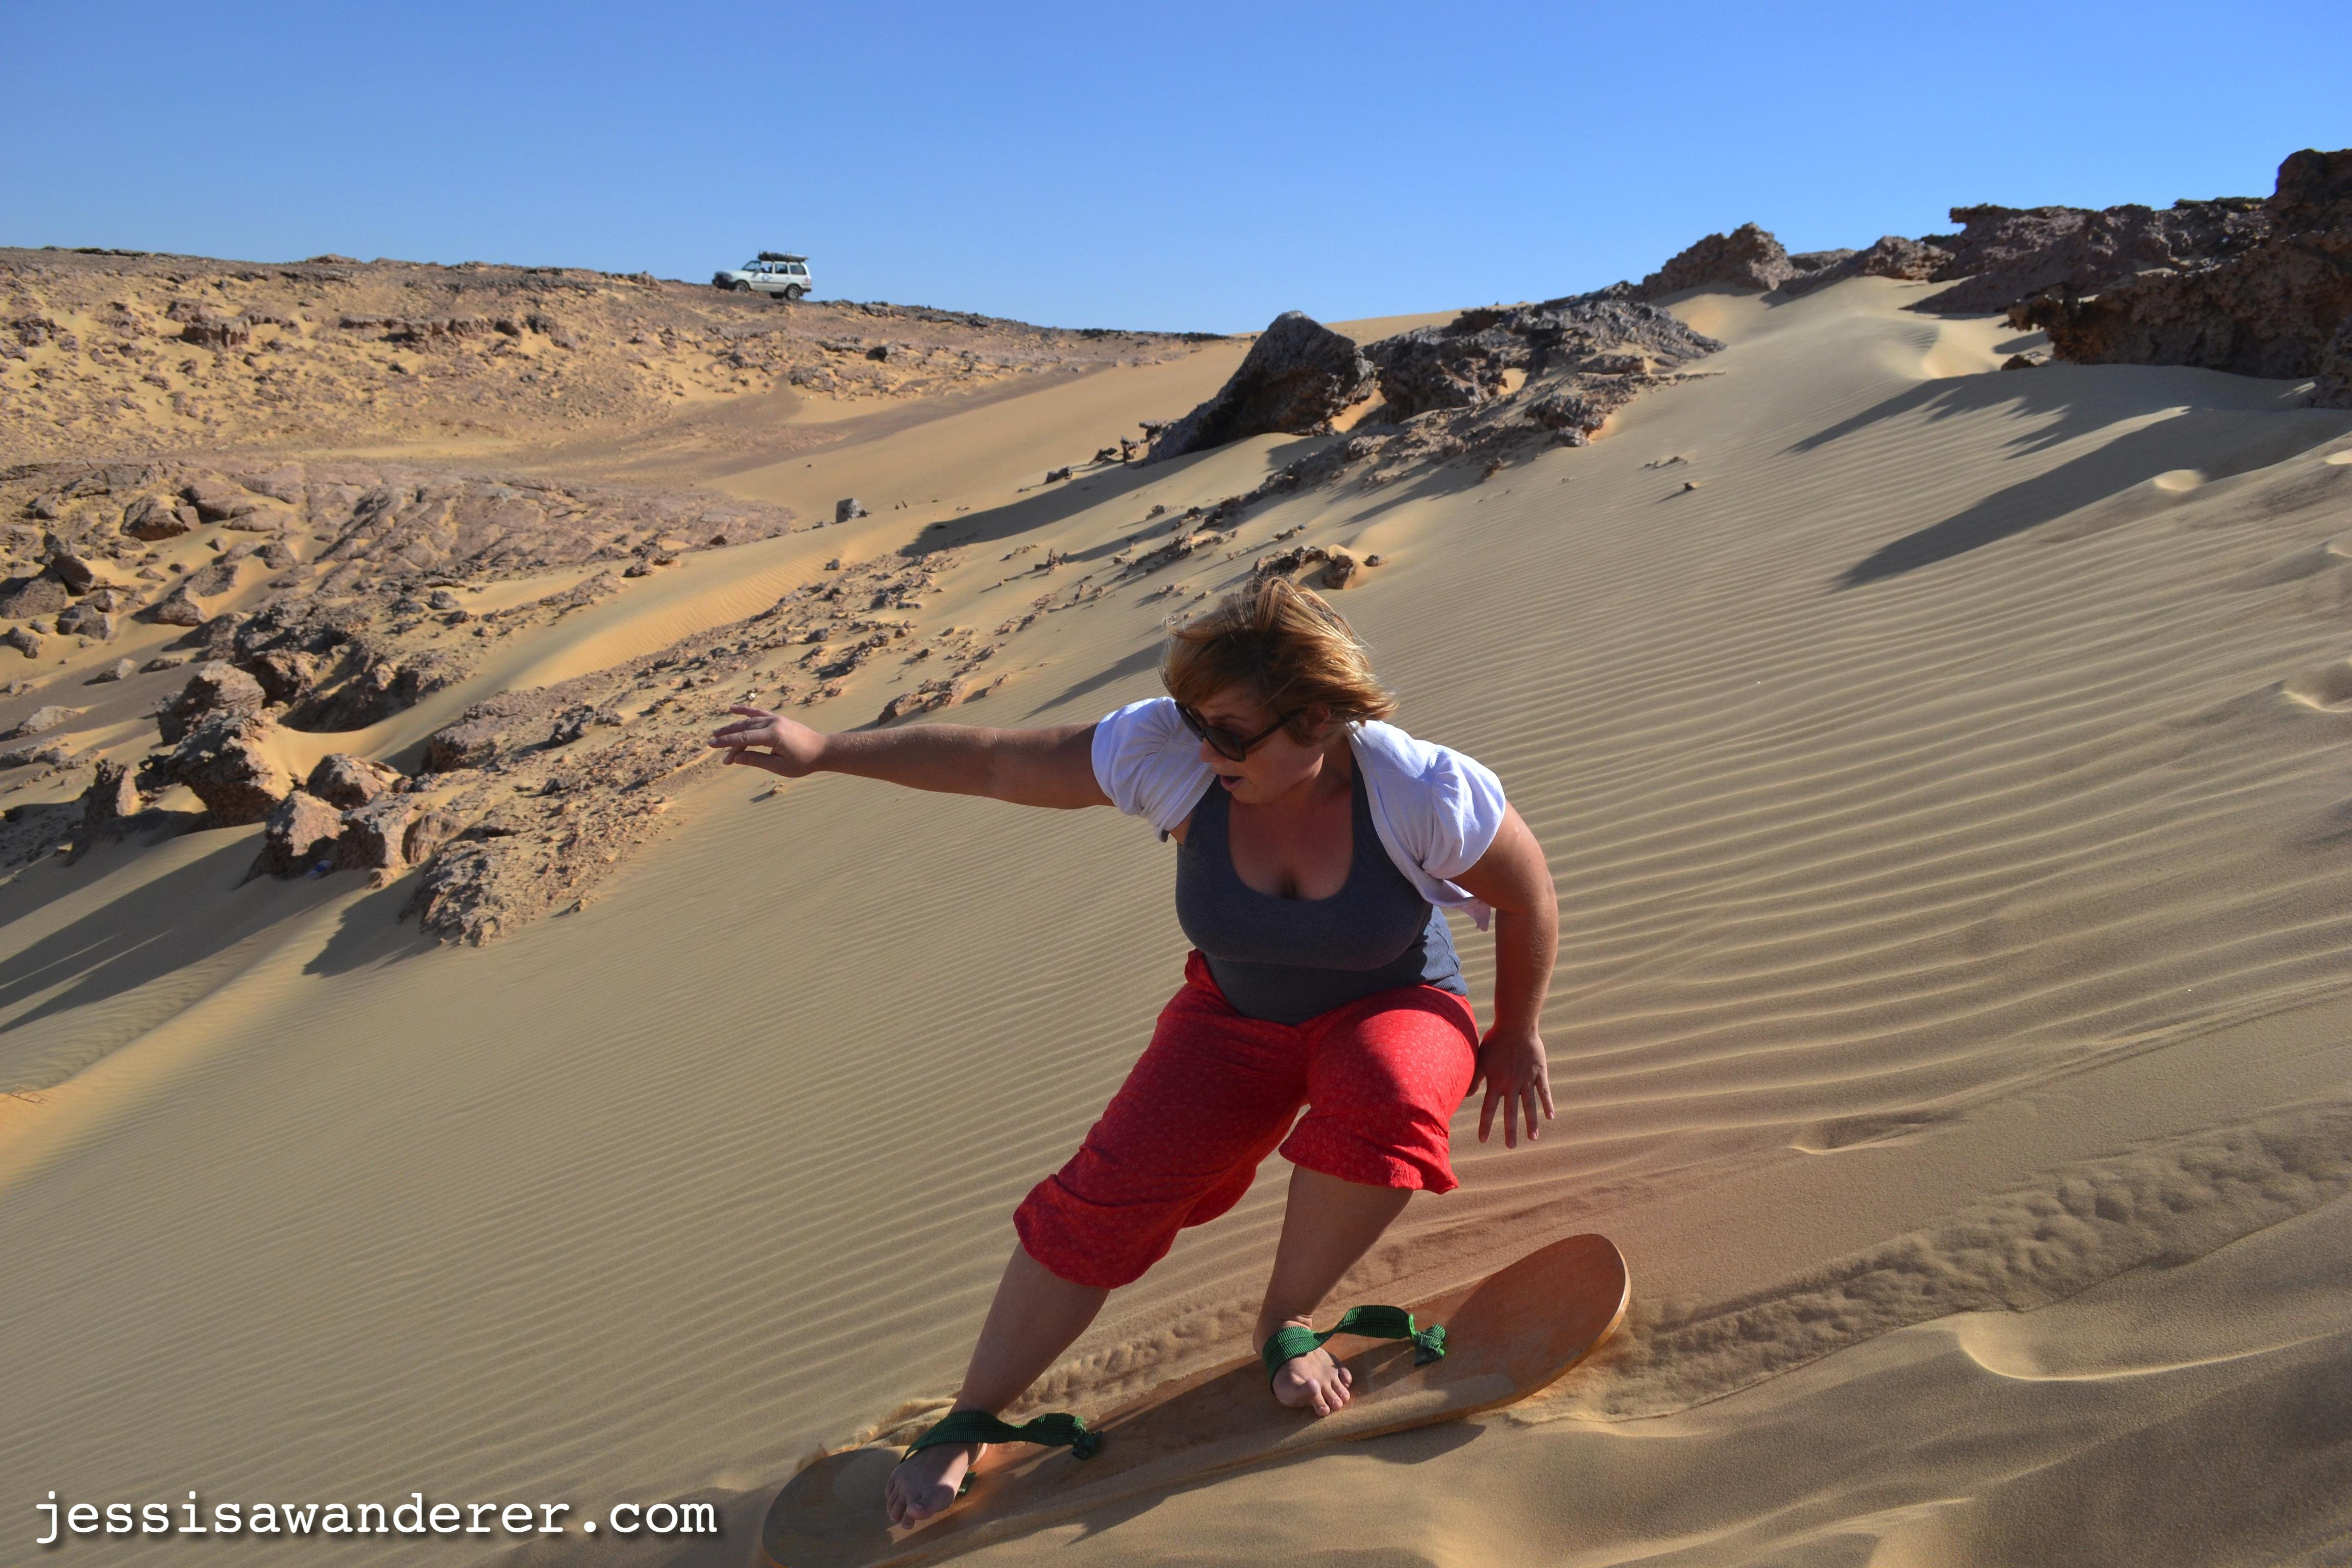 Sandboarding... if you dare